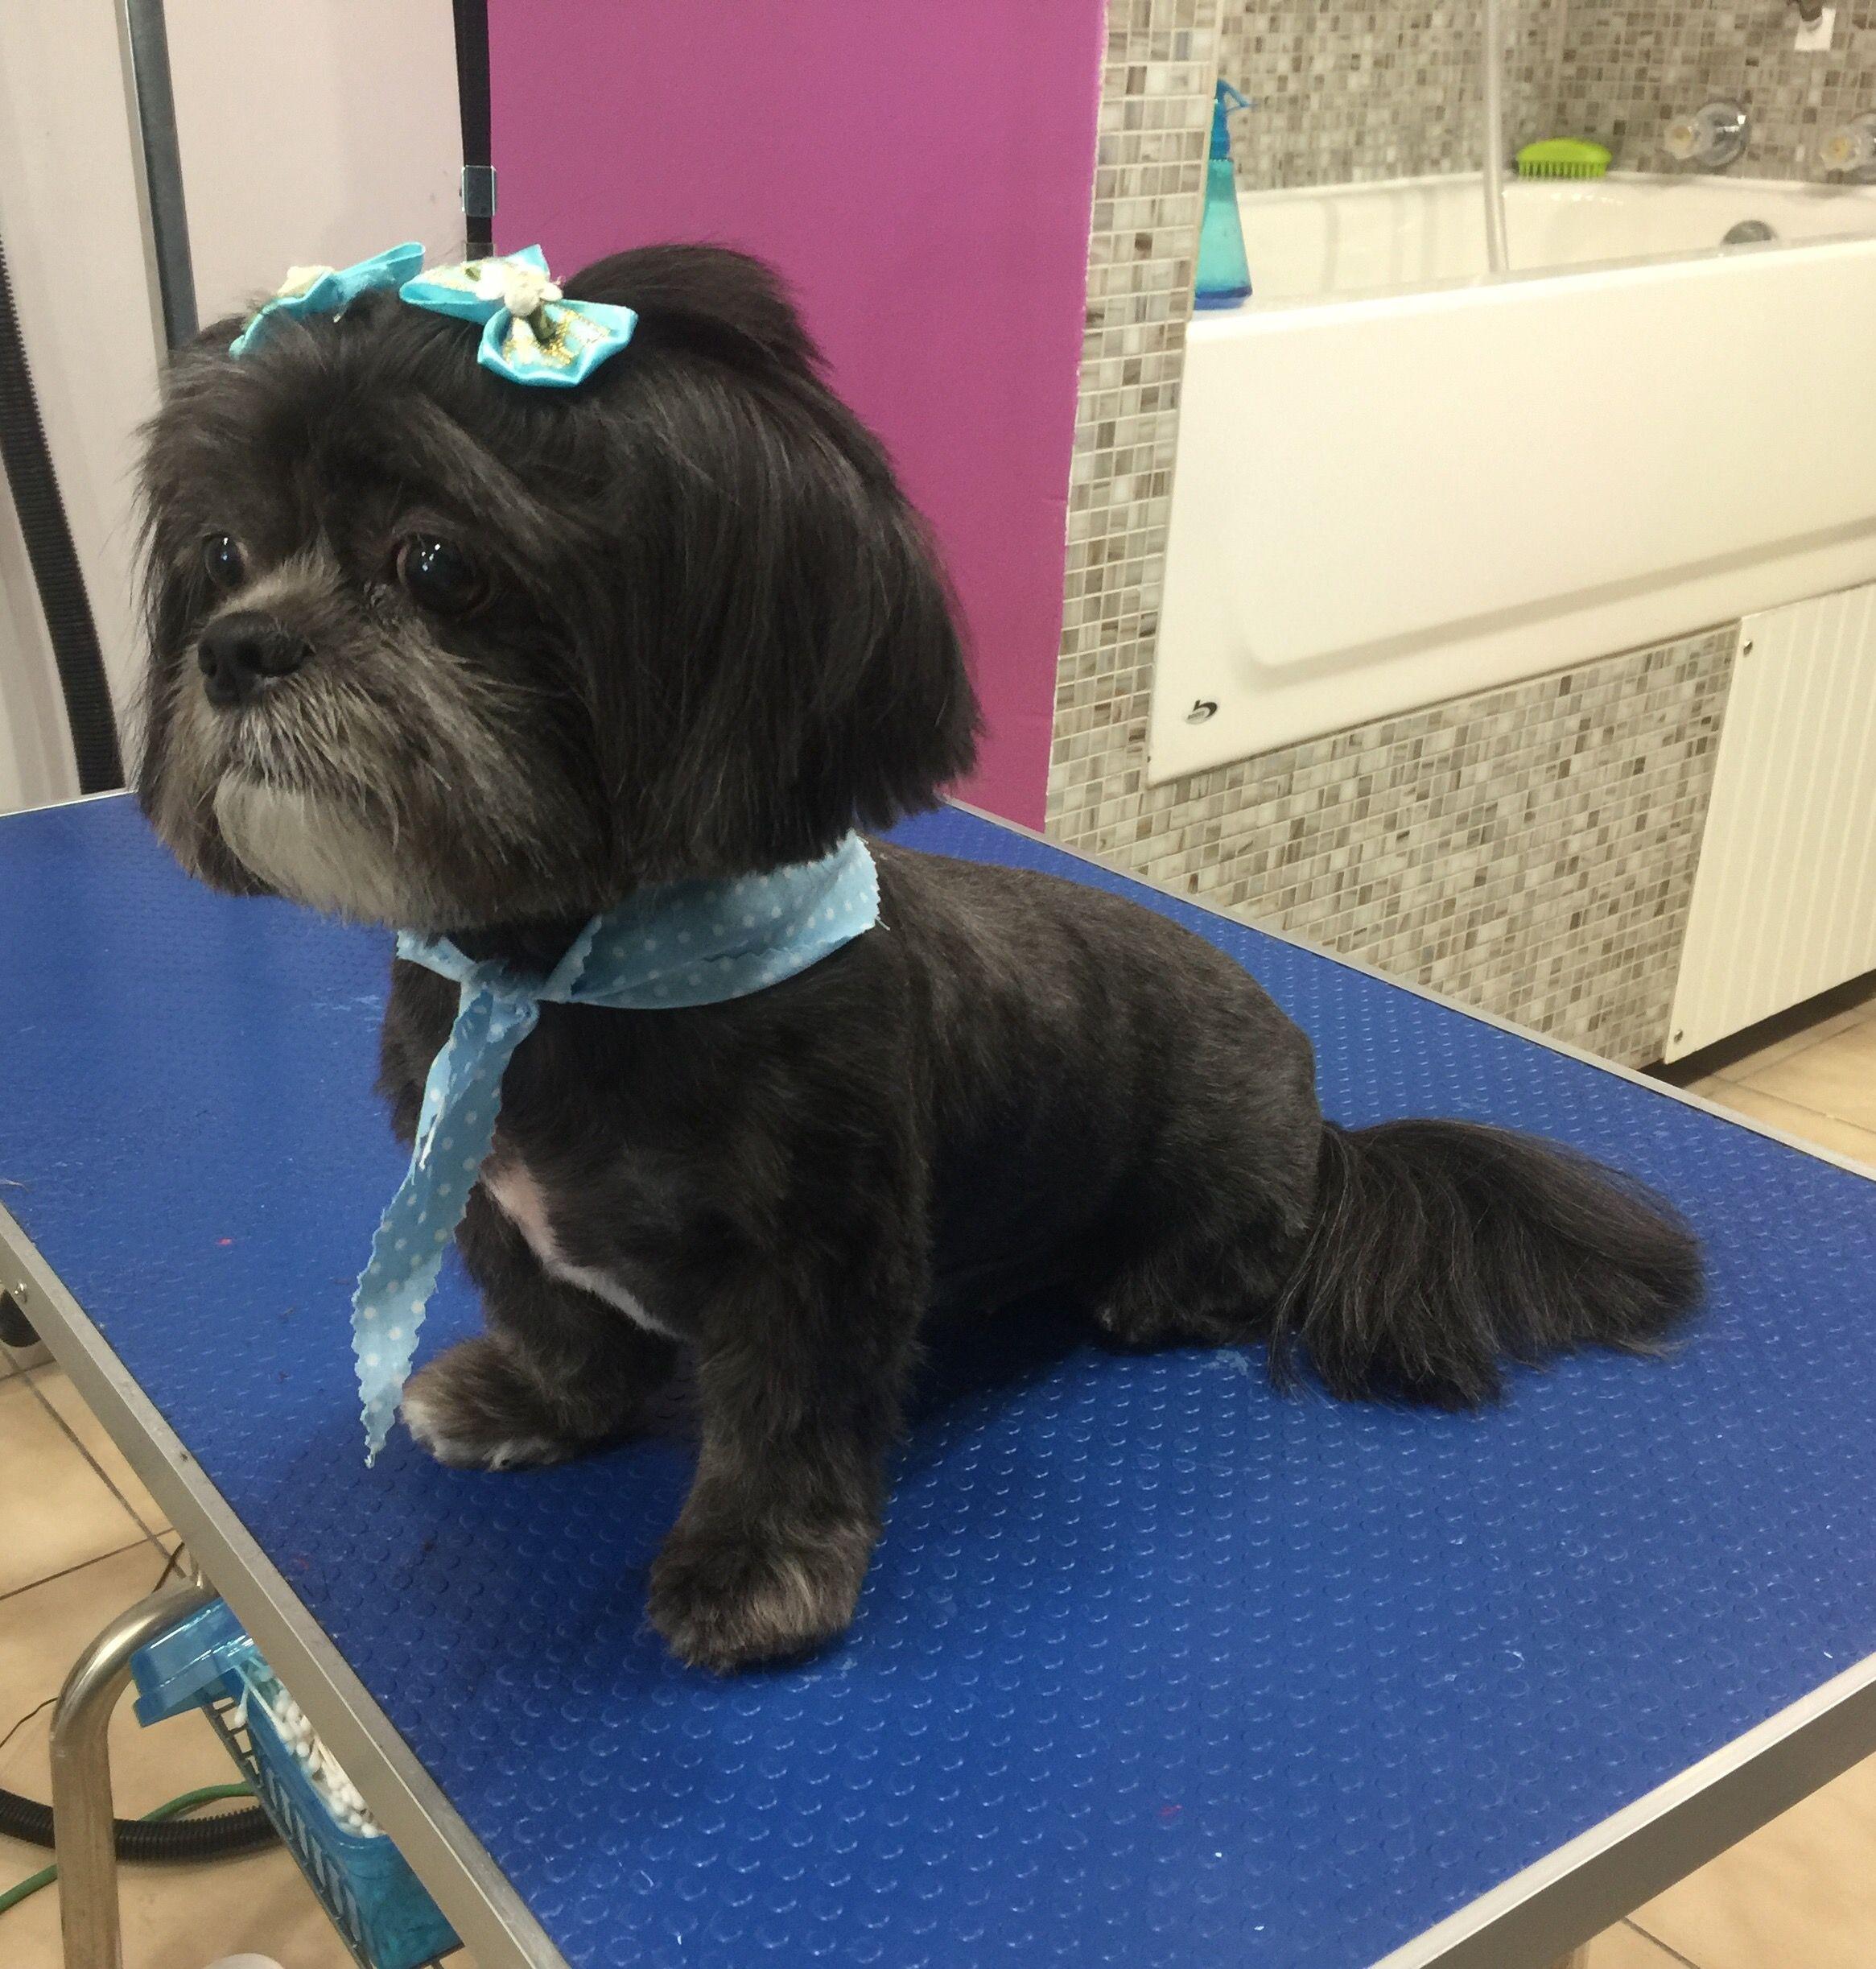 Shih Tzu Doggy Daycare Daycare Pet Hotel Pet Boarding Pet